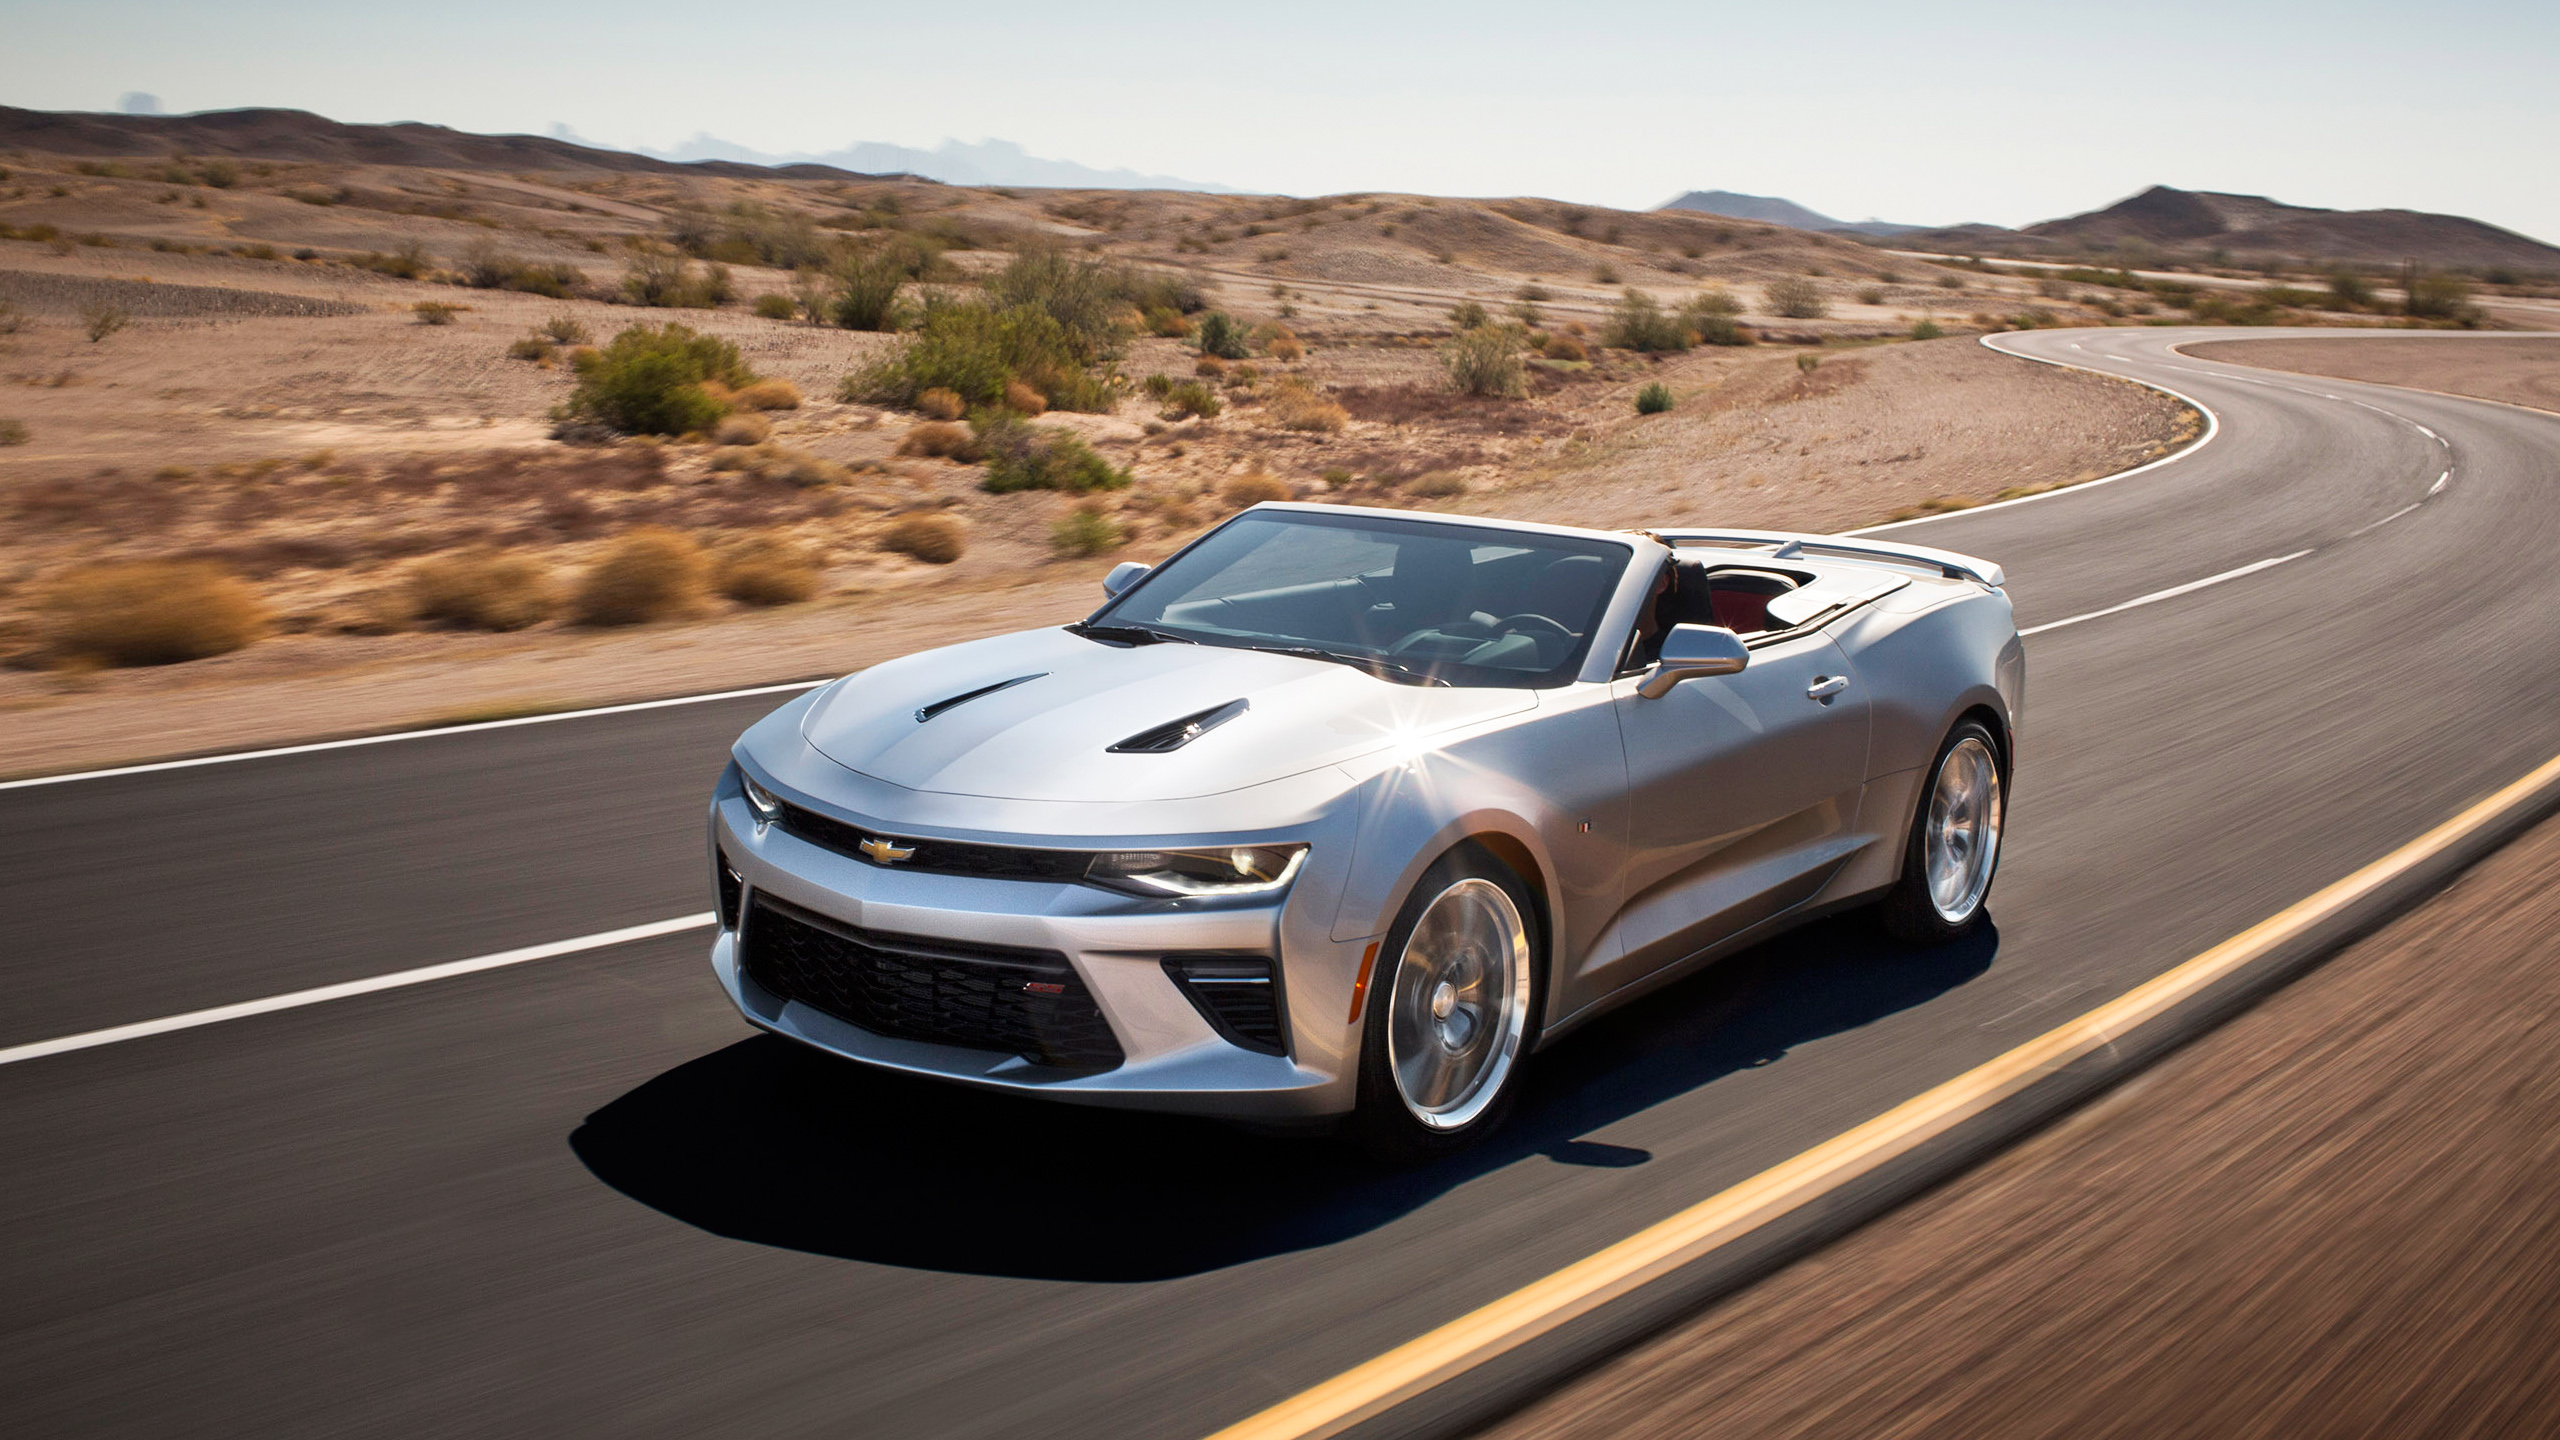 2016 Chevrolet Camaro Convertible Wallpaper | HD Car ...